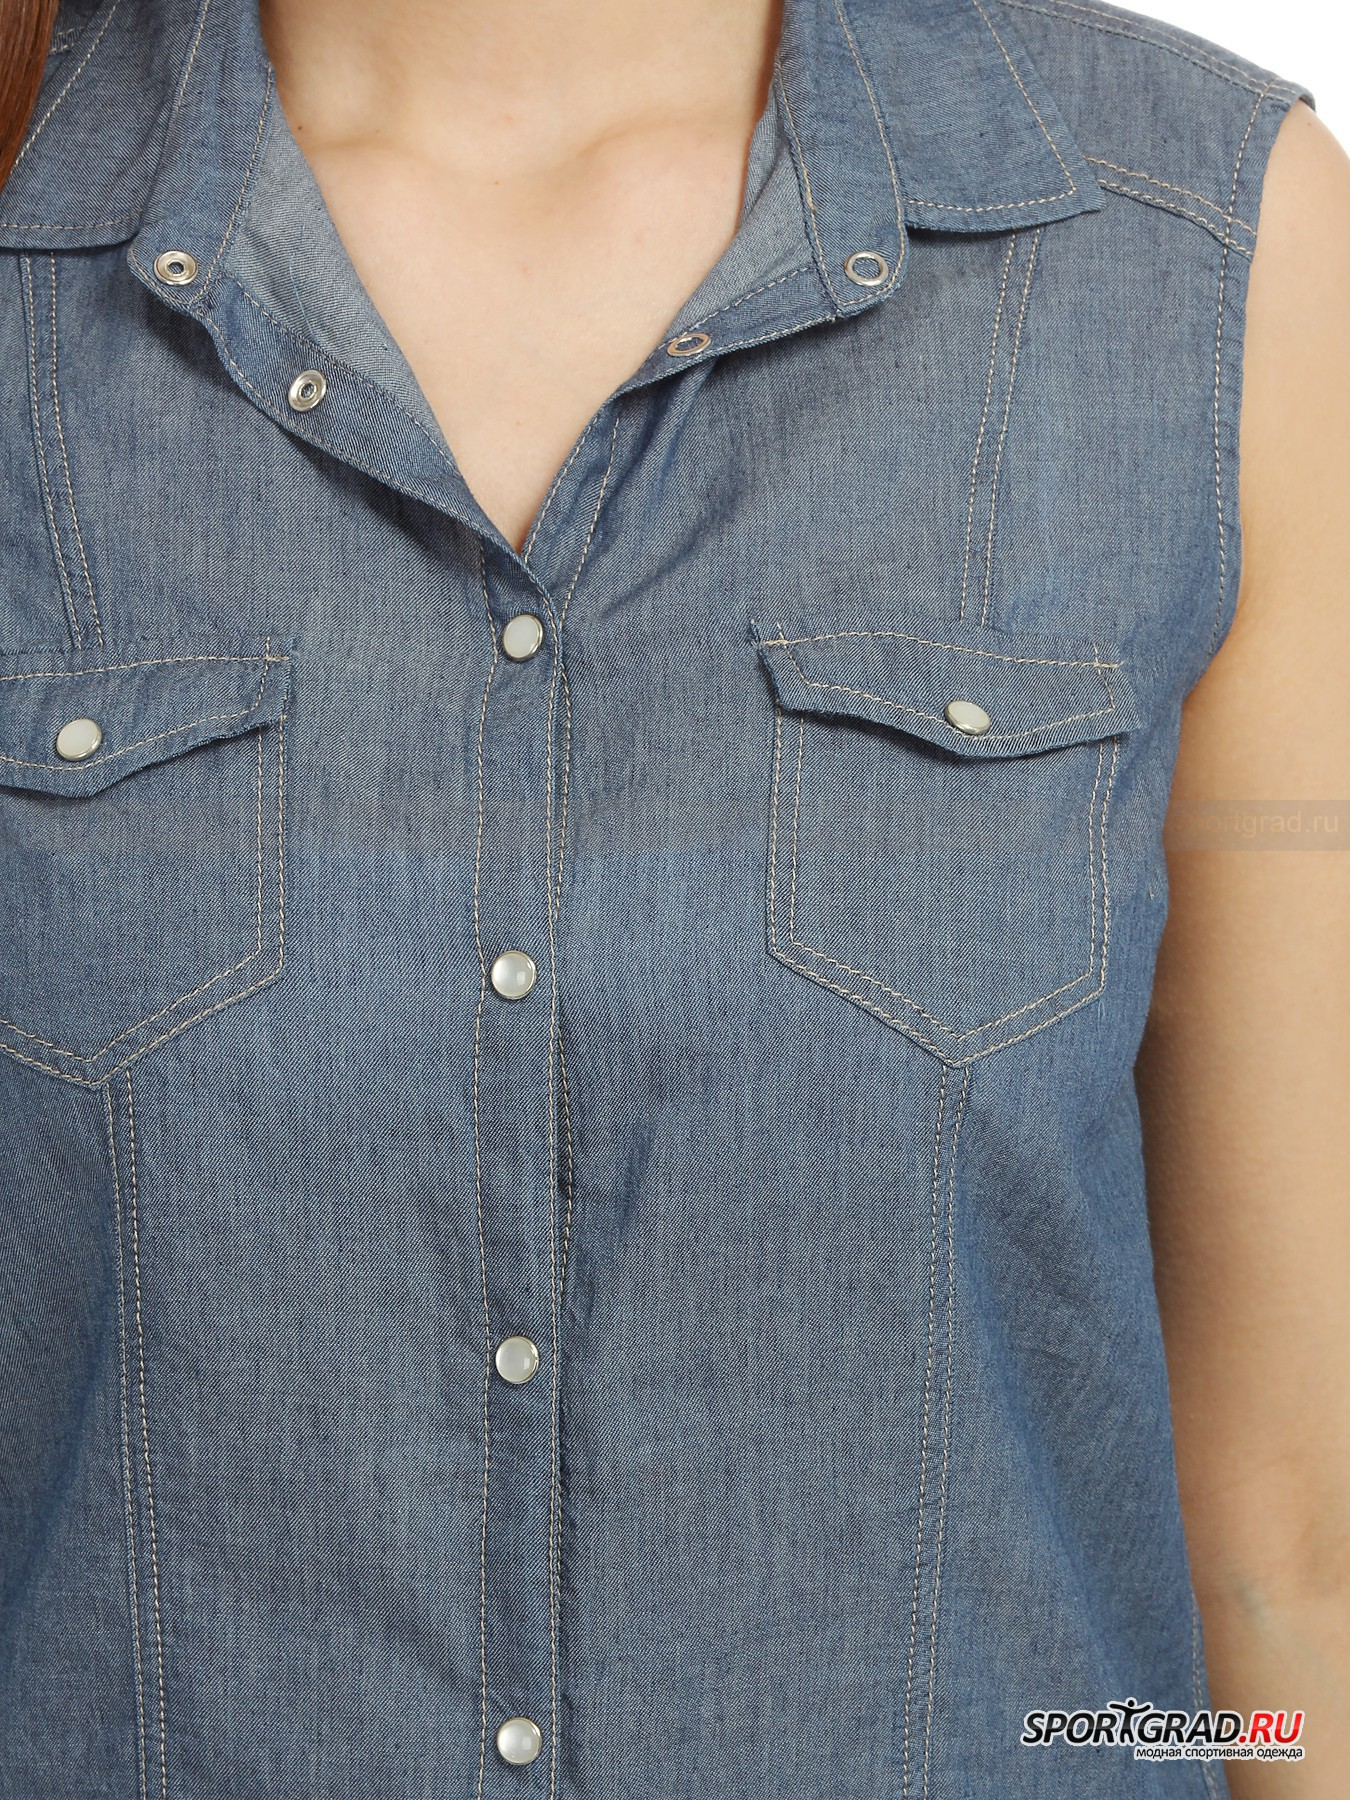 Рубашка женская хлопковая без рукавов SANDY BOGNER JEANS от Спортград